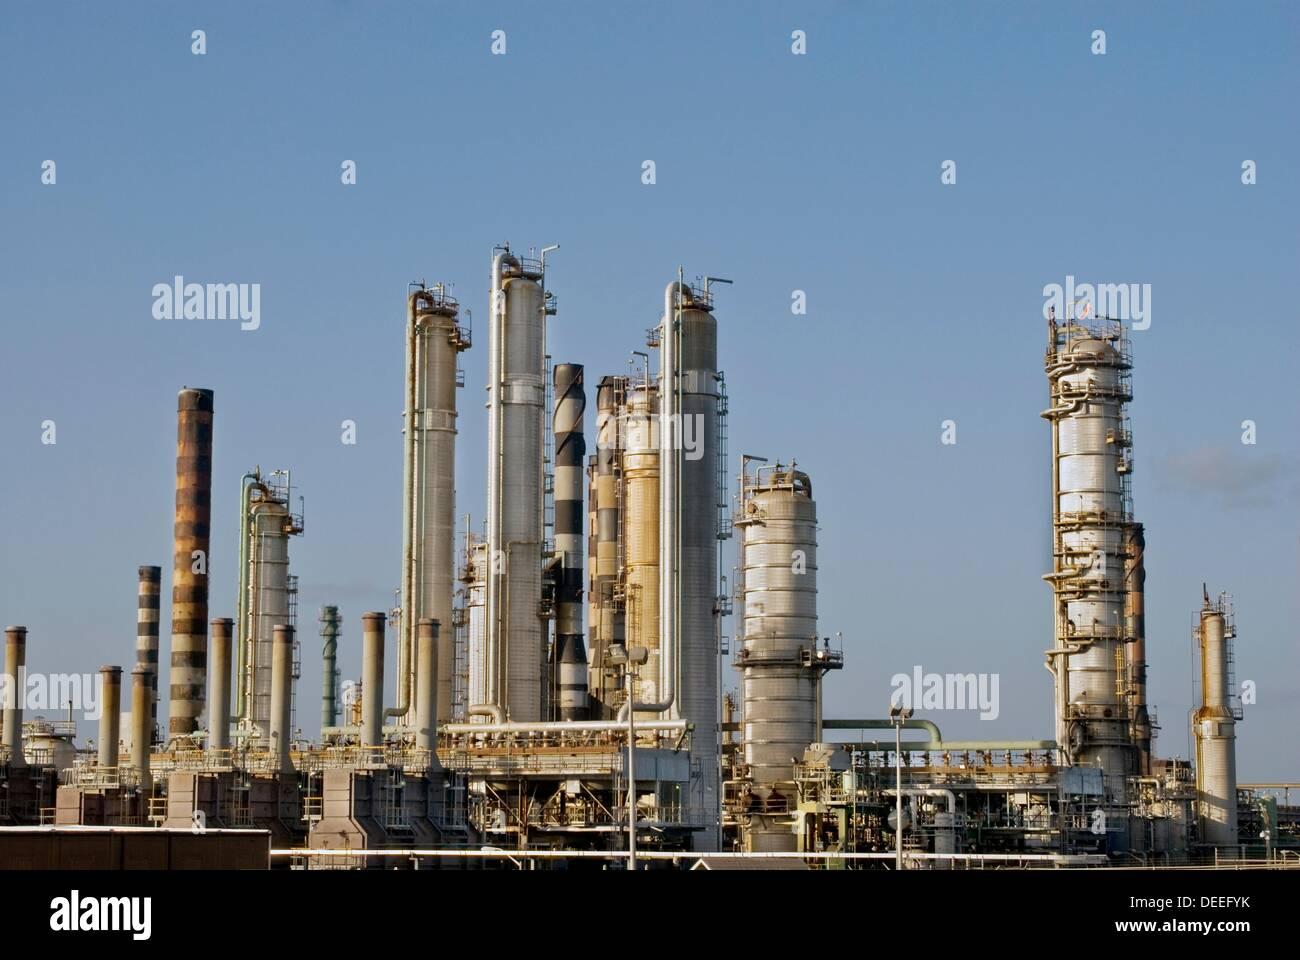 Hovensa Oil Refinery, St Croix, US Virgin Islands - Stock Image